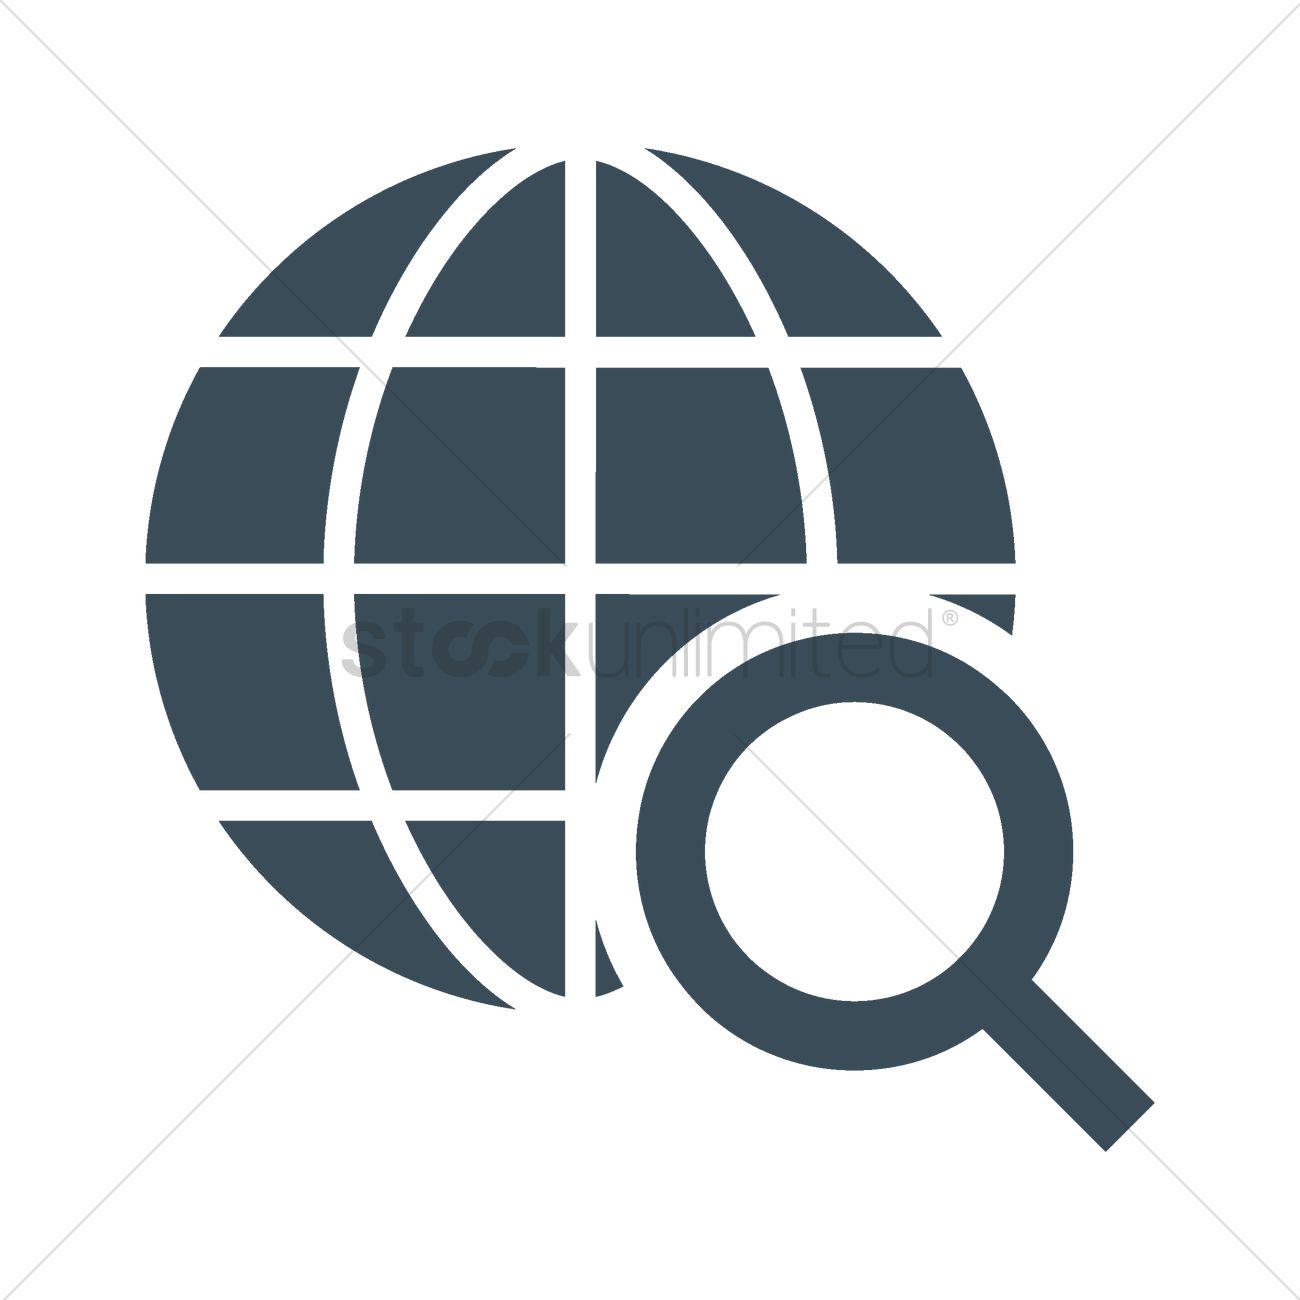 Internet search icon vector image 2005203 stockunlimited internet search icon vector graphic biocorpaavc